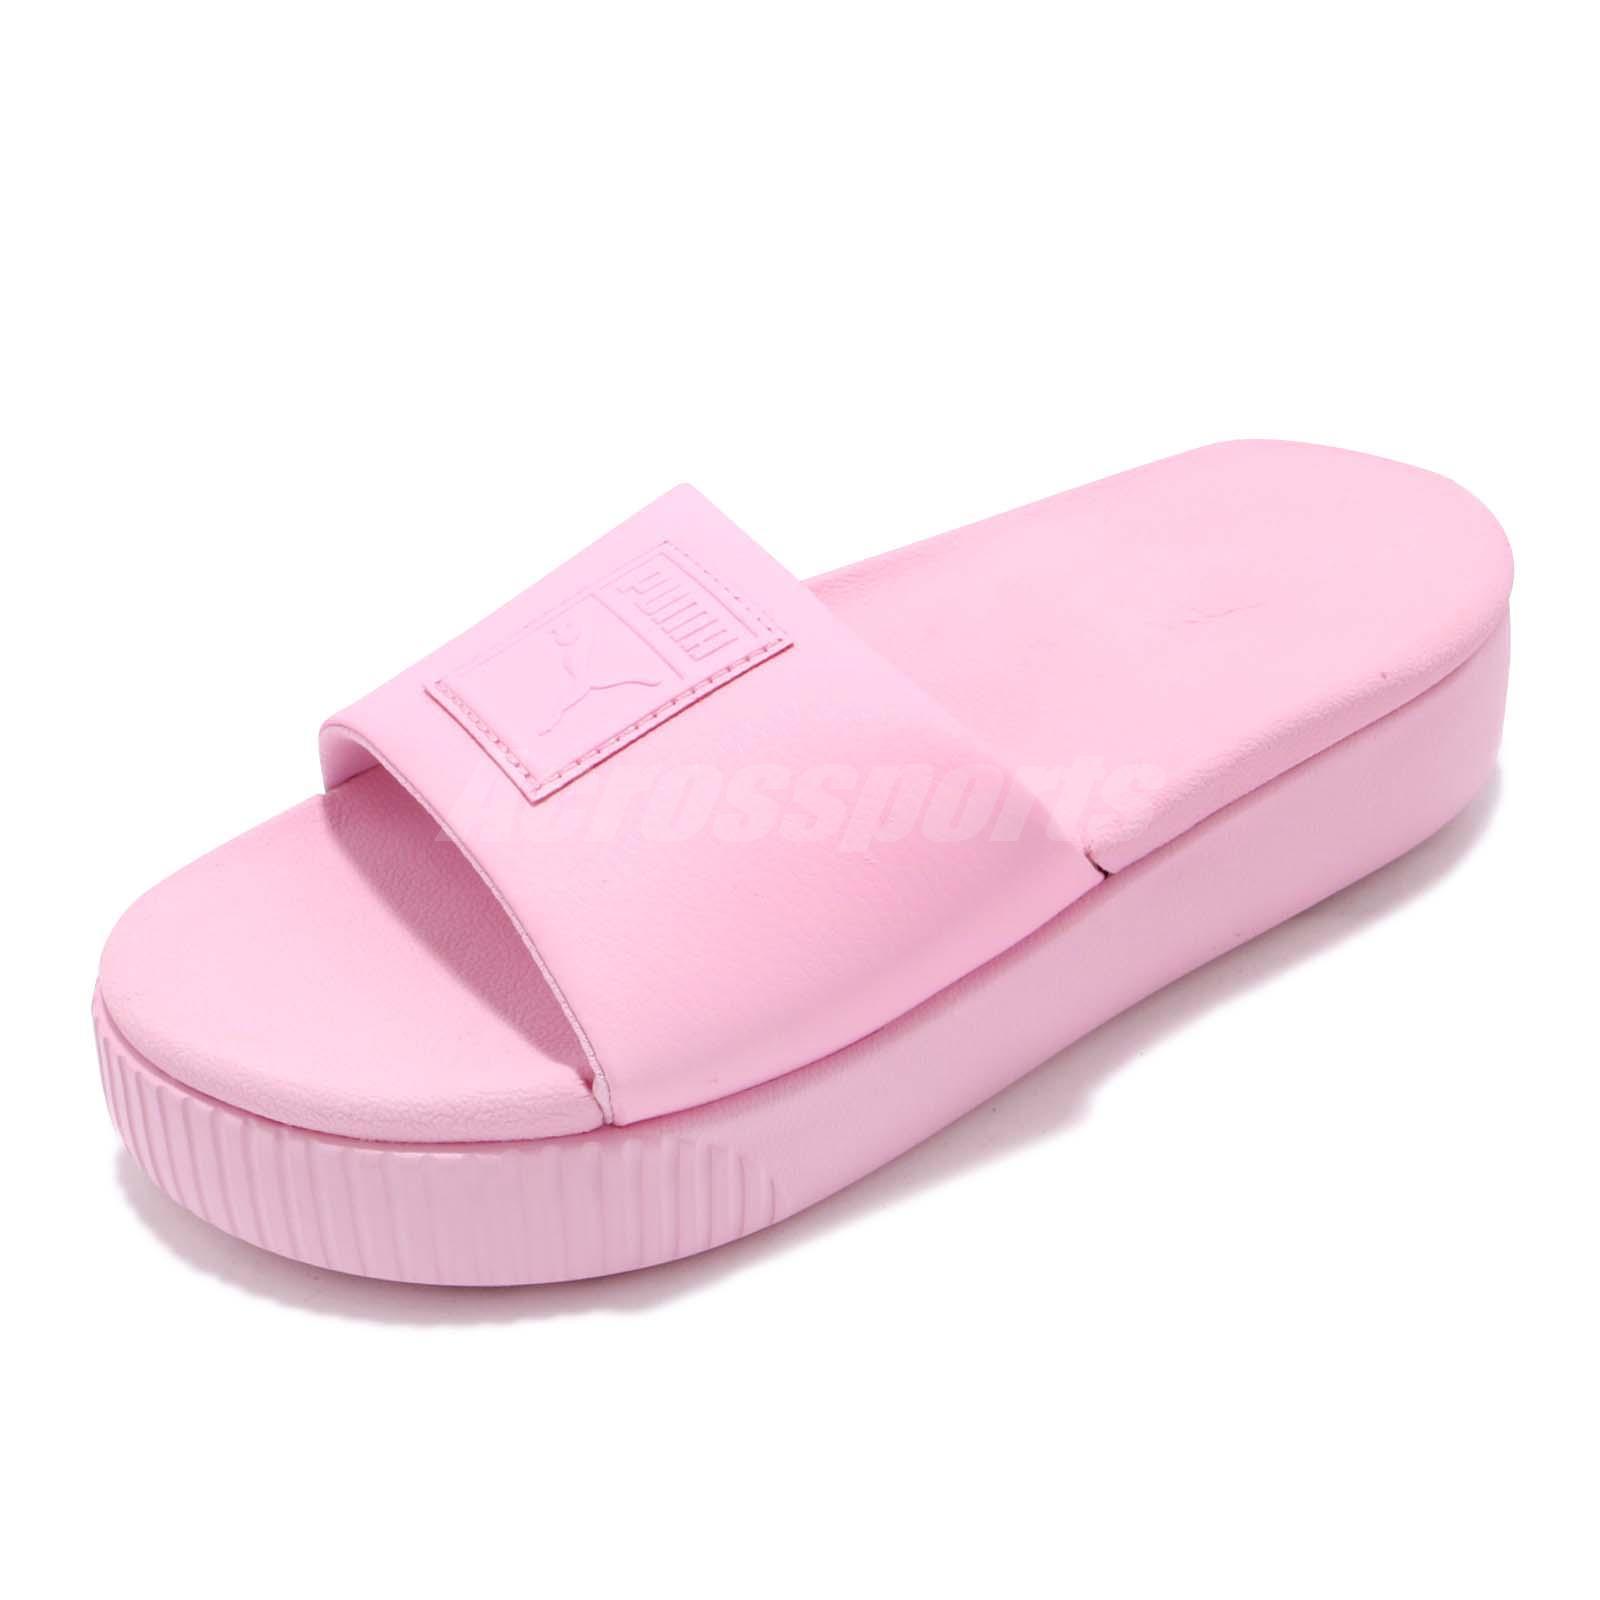 6a065a06bd66 Puma Platform Slide Wns Pale Pink Women Sports Sandals Slippers 366121-09